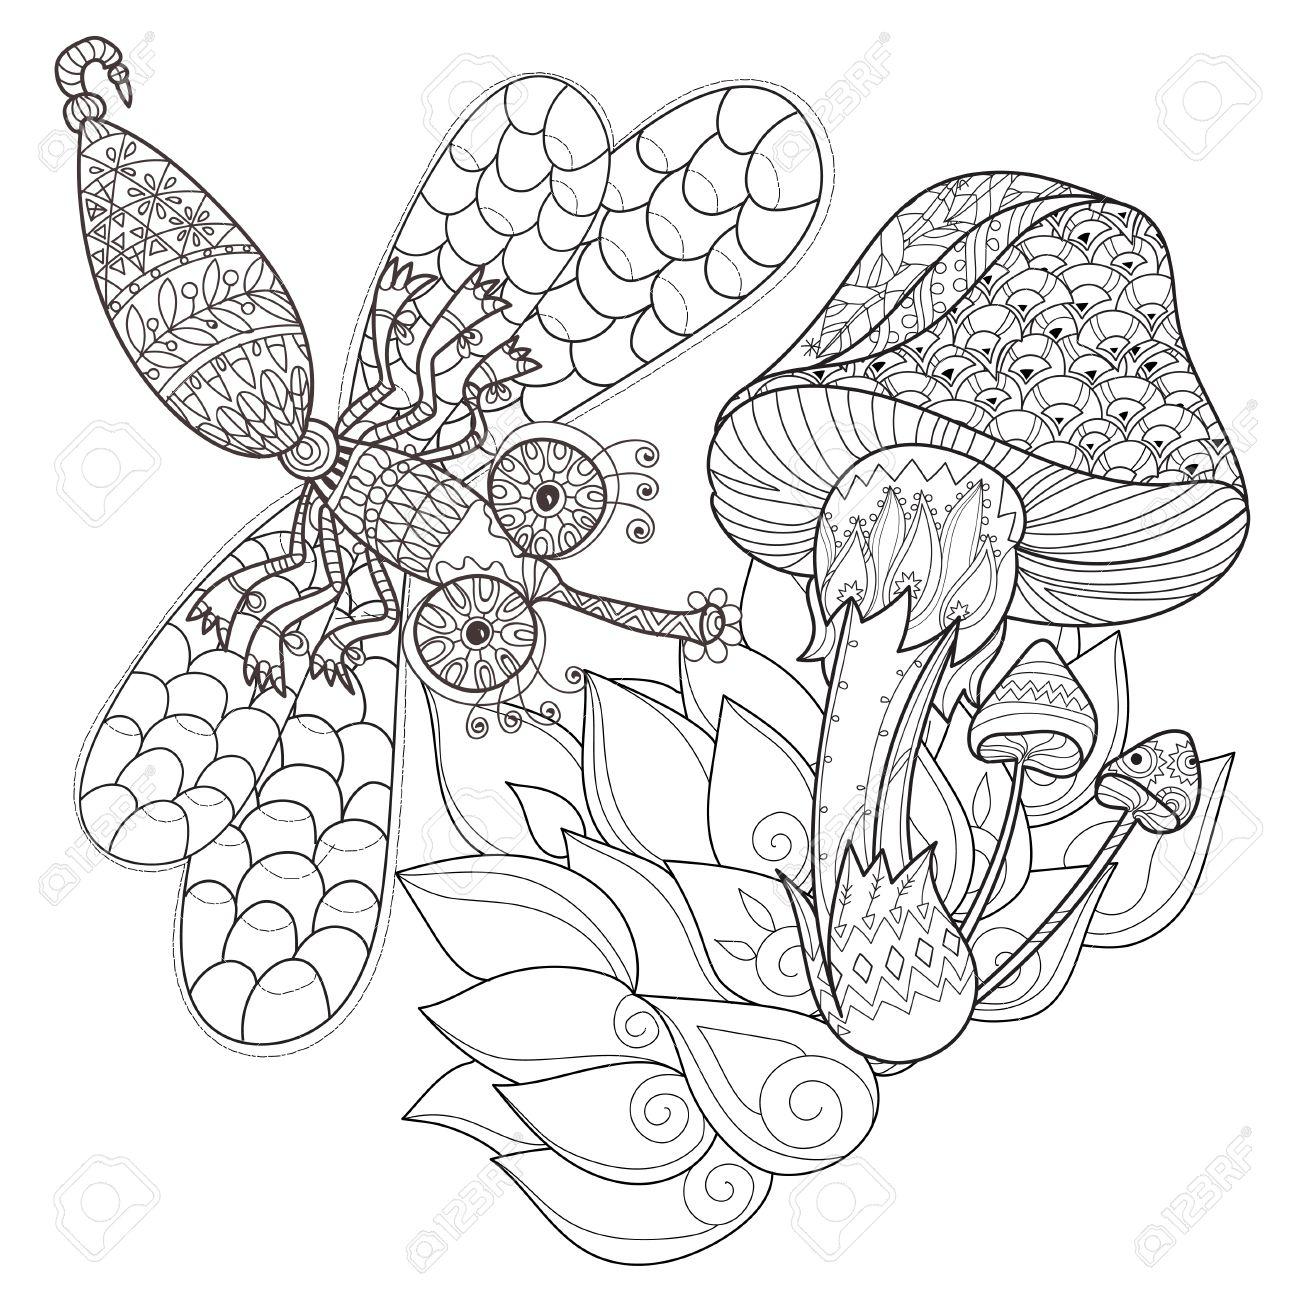 Mushrooms Doodle Art Adult Coloring Page | Karyn Lewis Illustration | 1300x1300